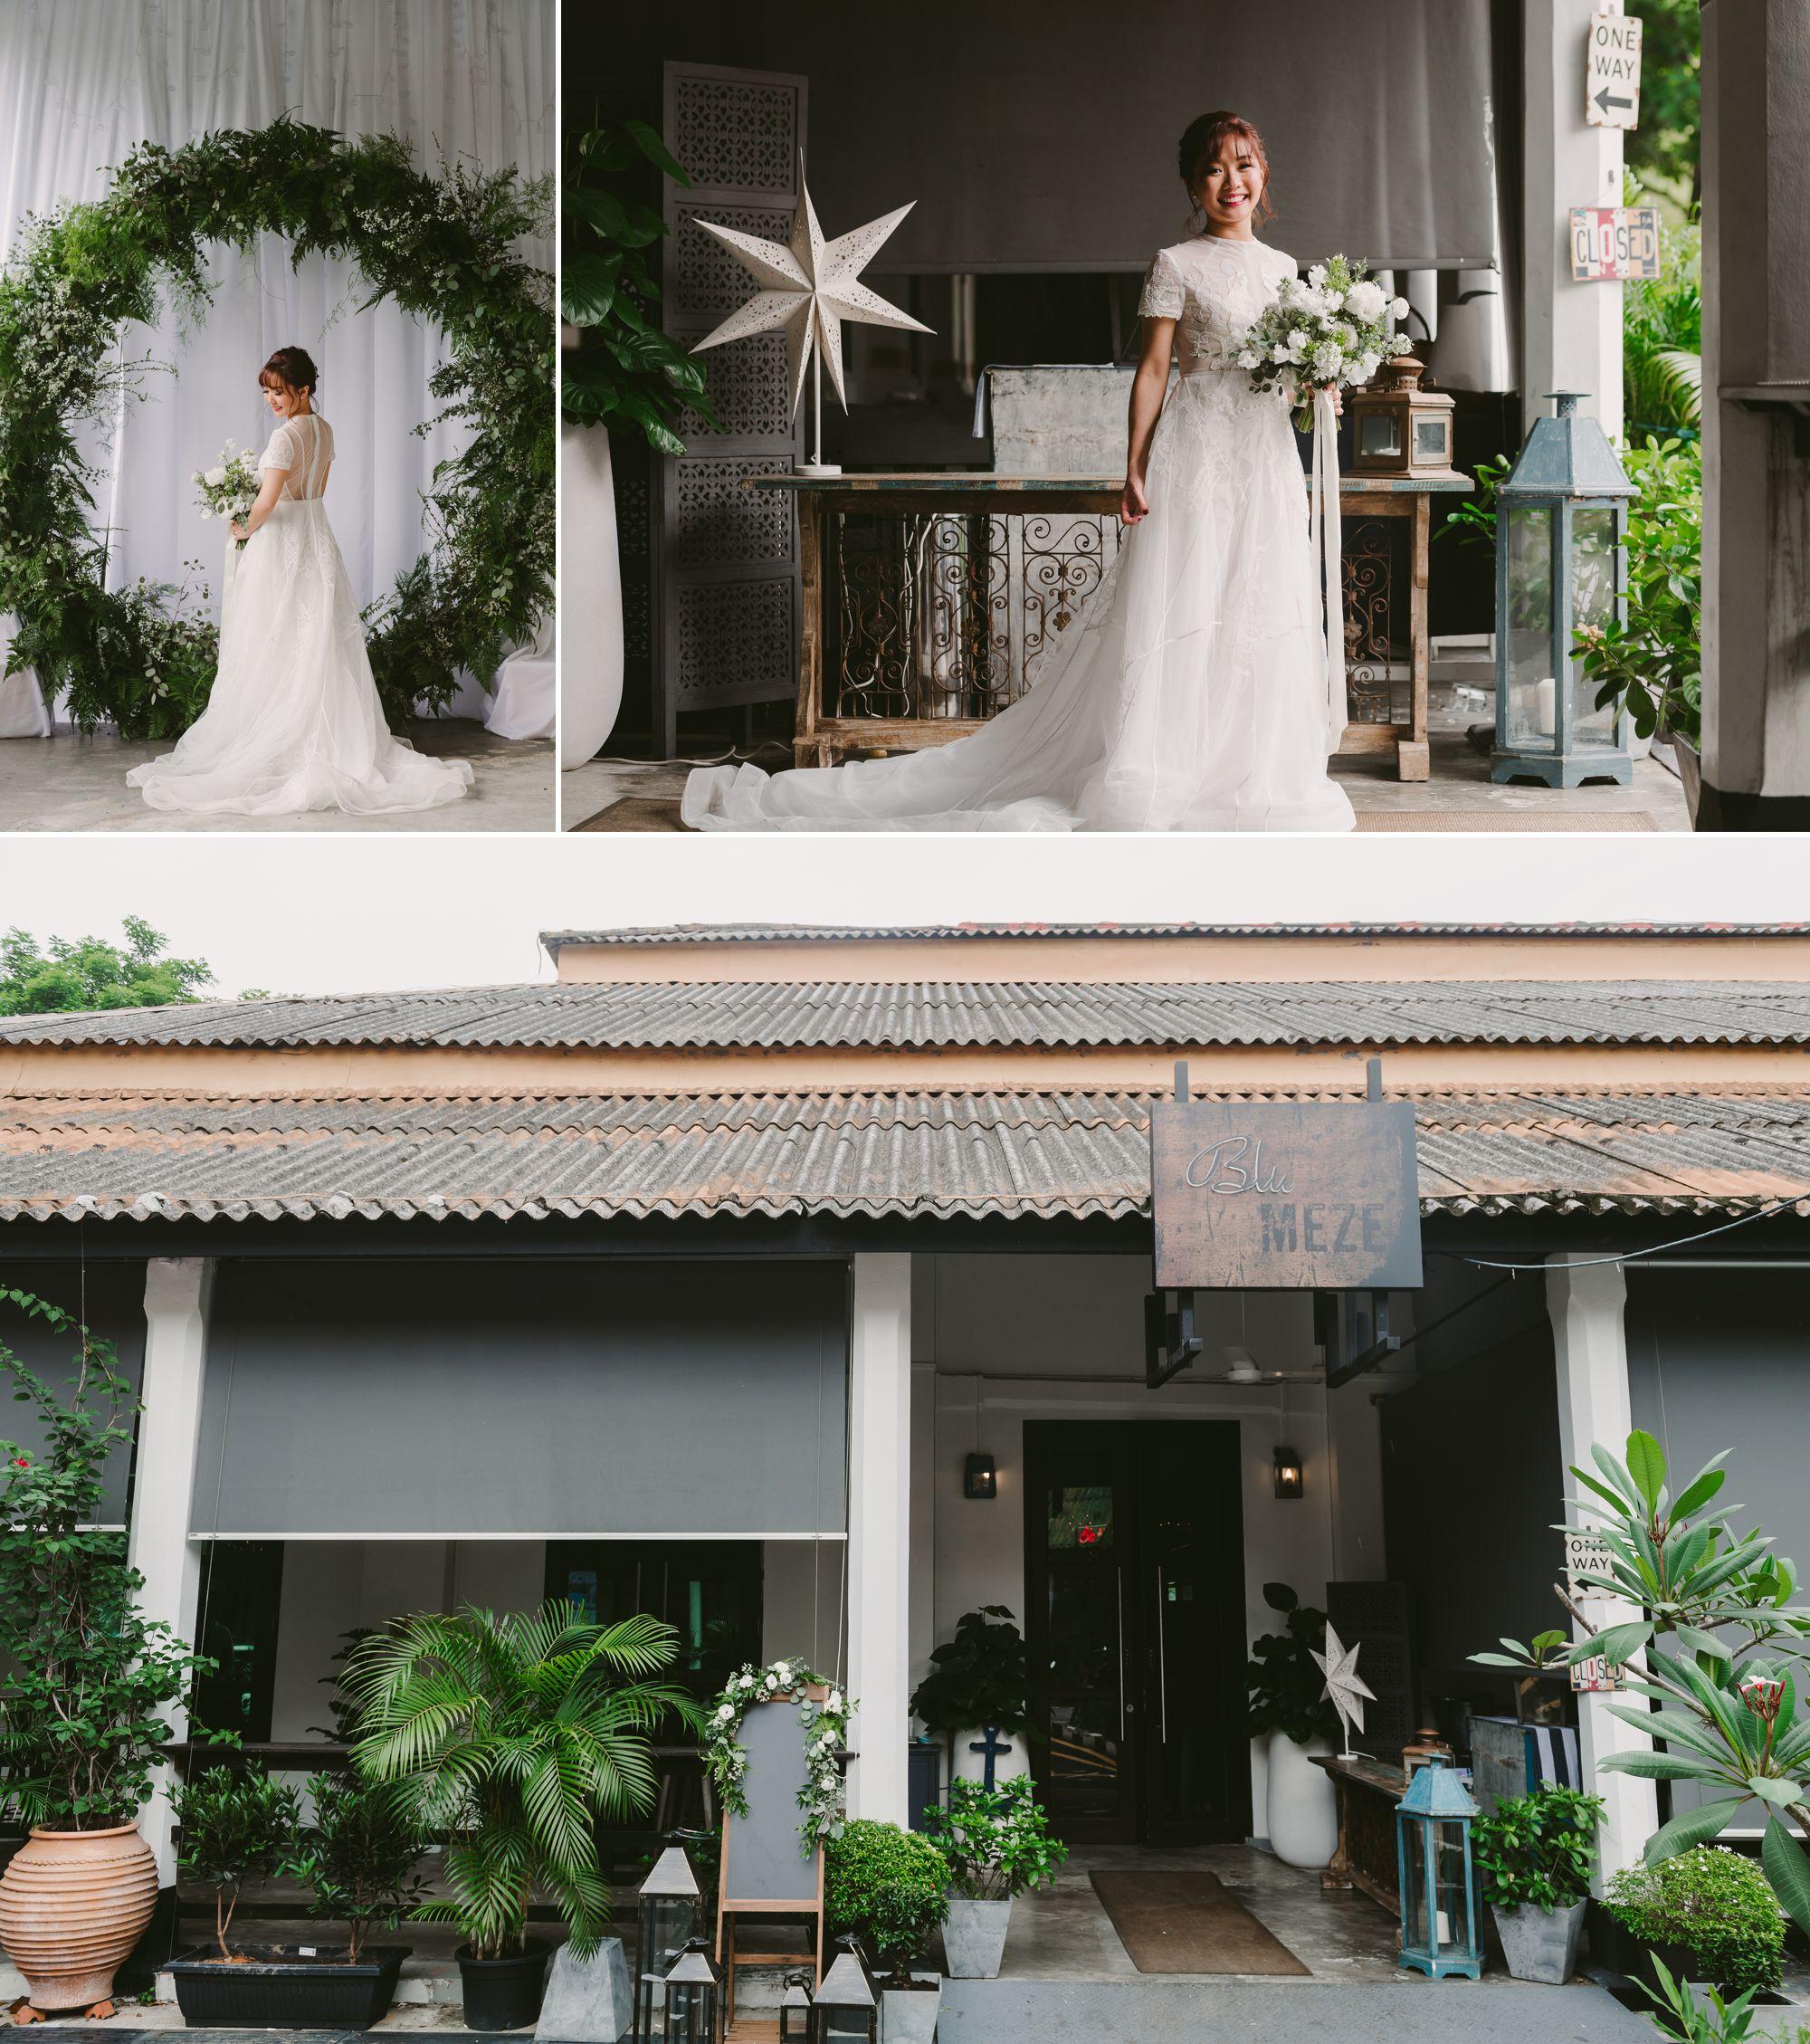 wedding_photography 6.jpg